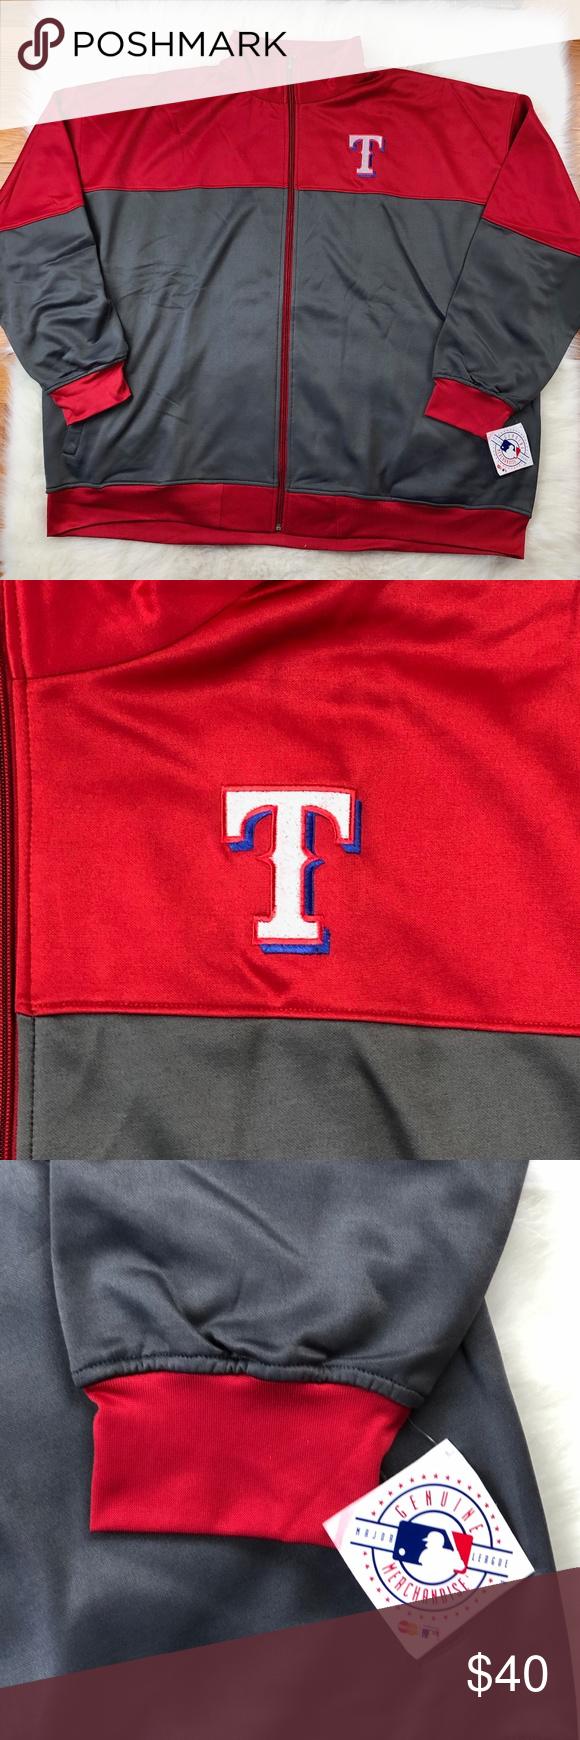 Mlb Texas Rangers Full Zip Big Man Track Jacket Texas Rangers Mlb Texas Rangers Mlb Jackets